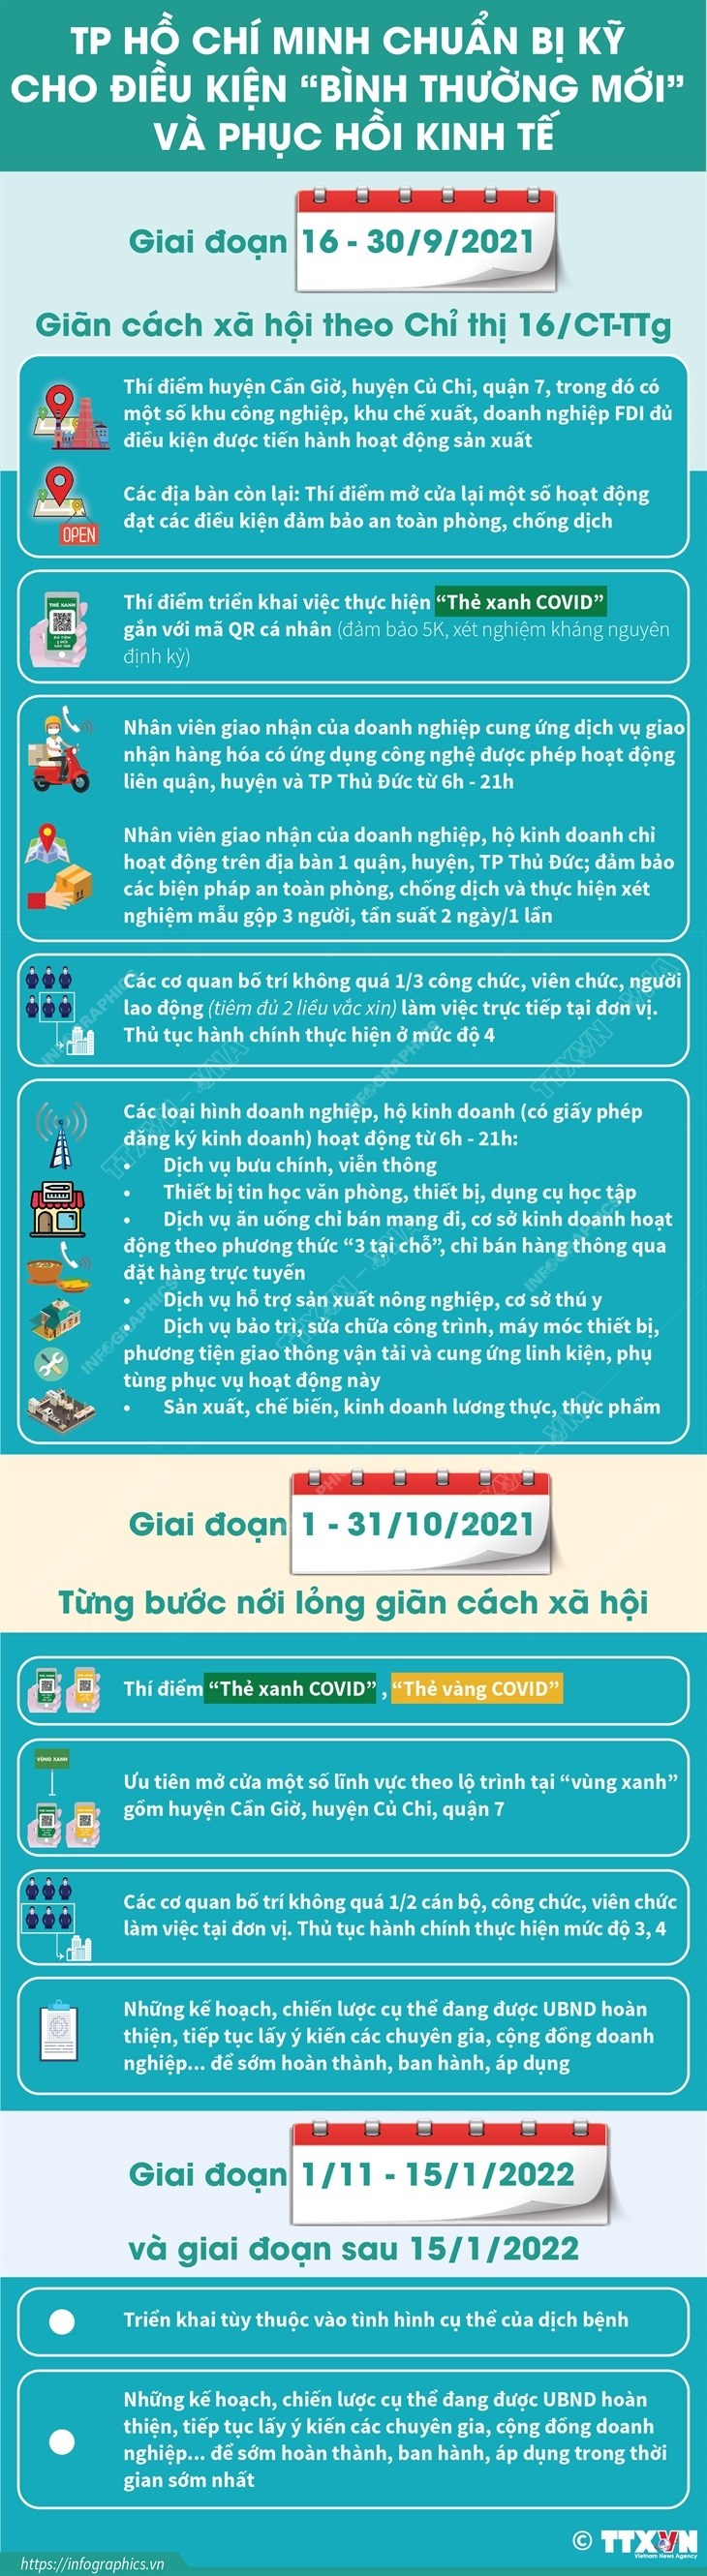 "TP.HCM chuan bi ky cho dieu kien ""binh thuong moi"" va phuc hoi kinh te hinh anh 1"